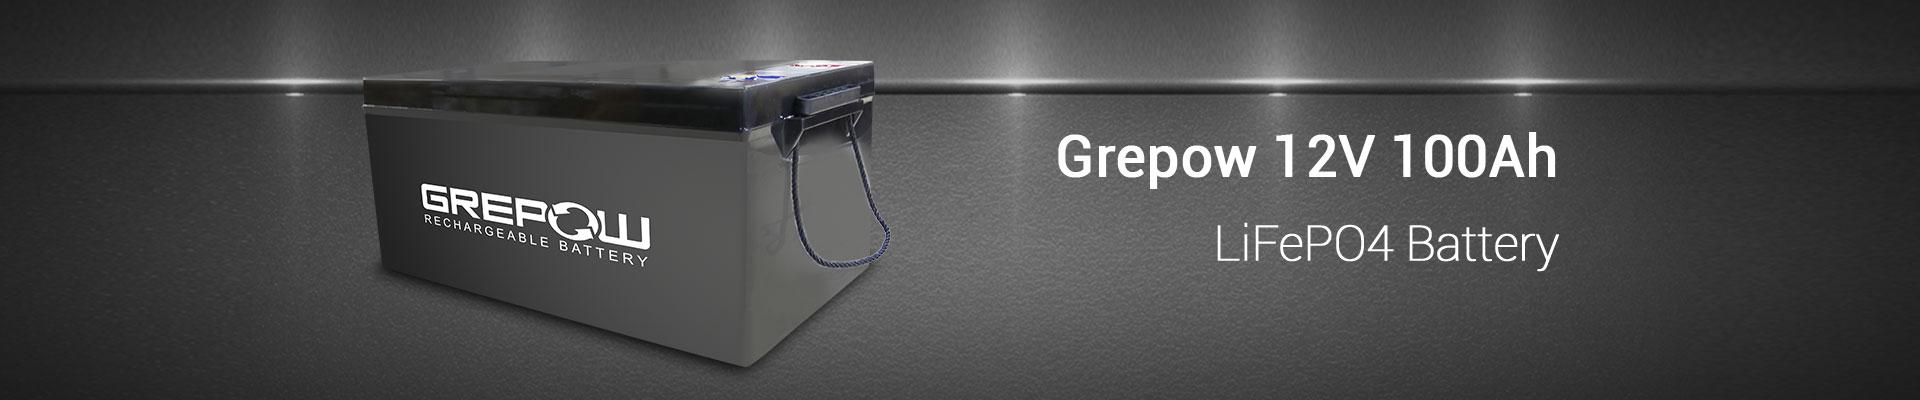 Grepow 12V 100Ah LiFePO4 battery banner